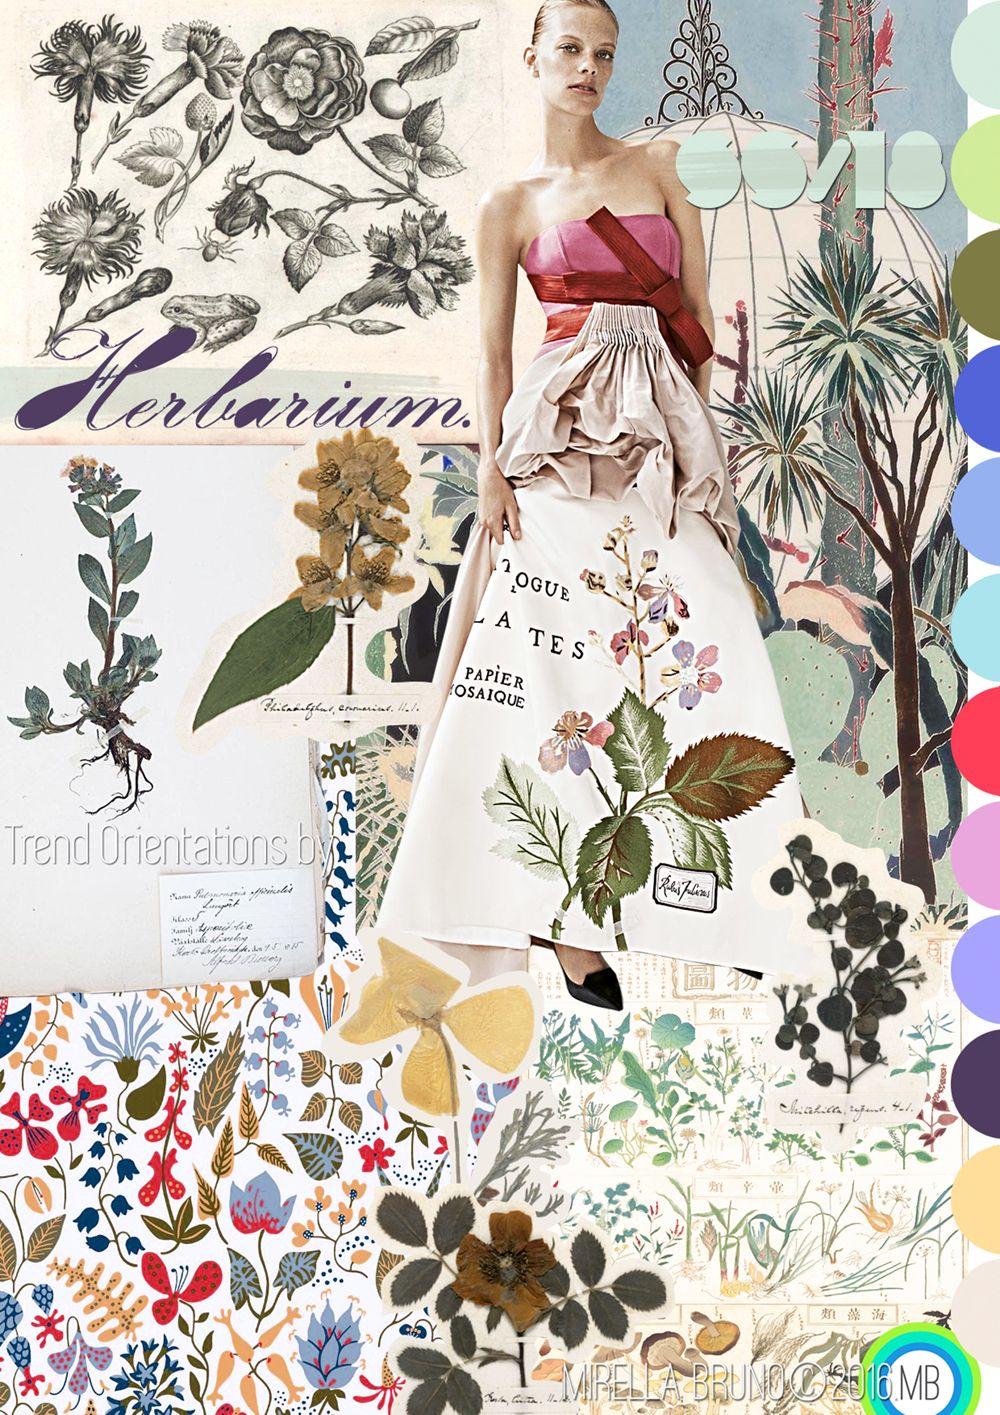 Lace bra under dress september 2019 Trend Orientations  Mirella Bruno Textile Print Trend Colour Design